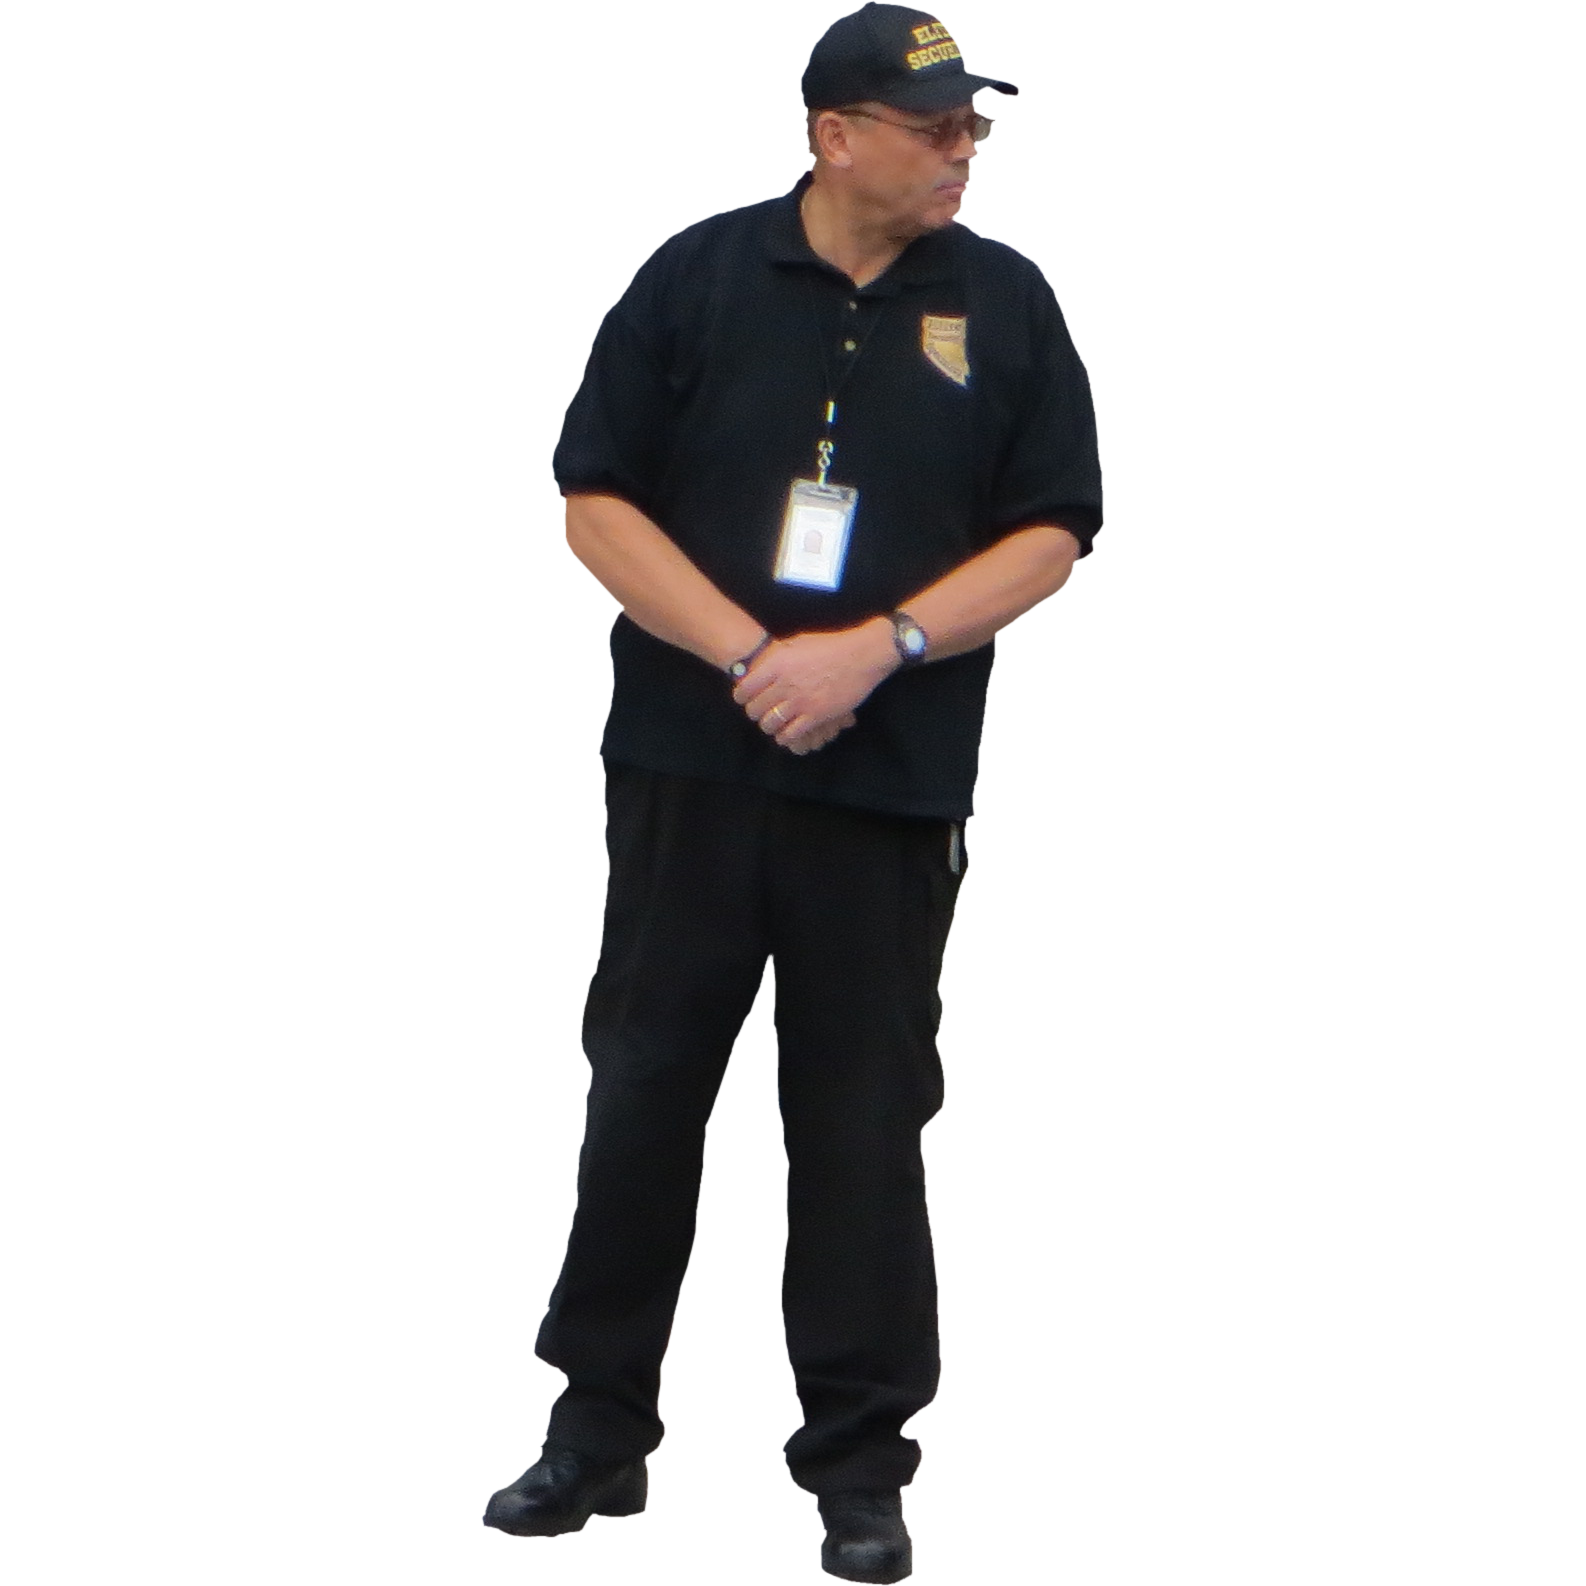 clipart transparent download Guard clipart uniform shirt. Png background image mart